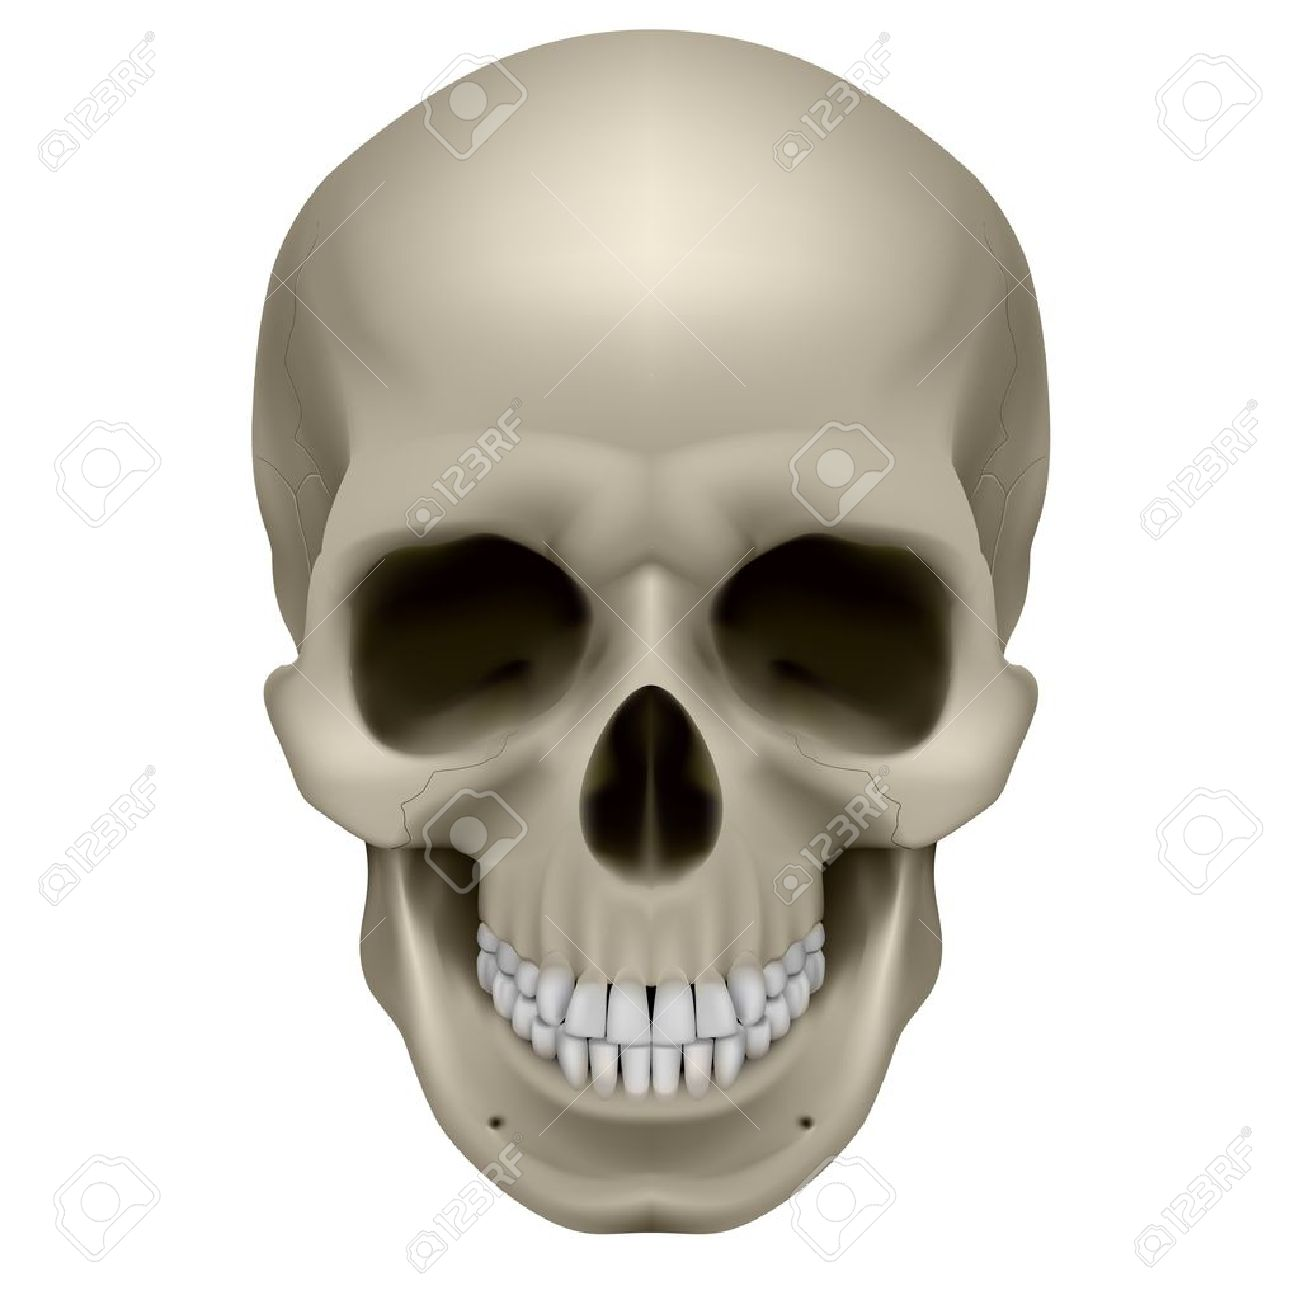 Human skull, front view. Digital illustration on white Stock Vector - 13329163